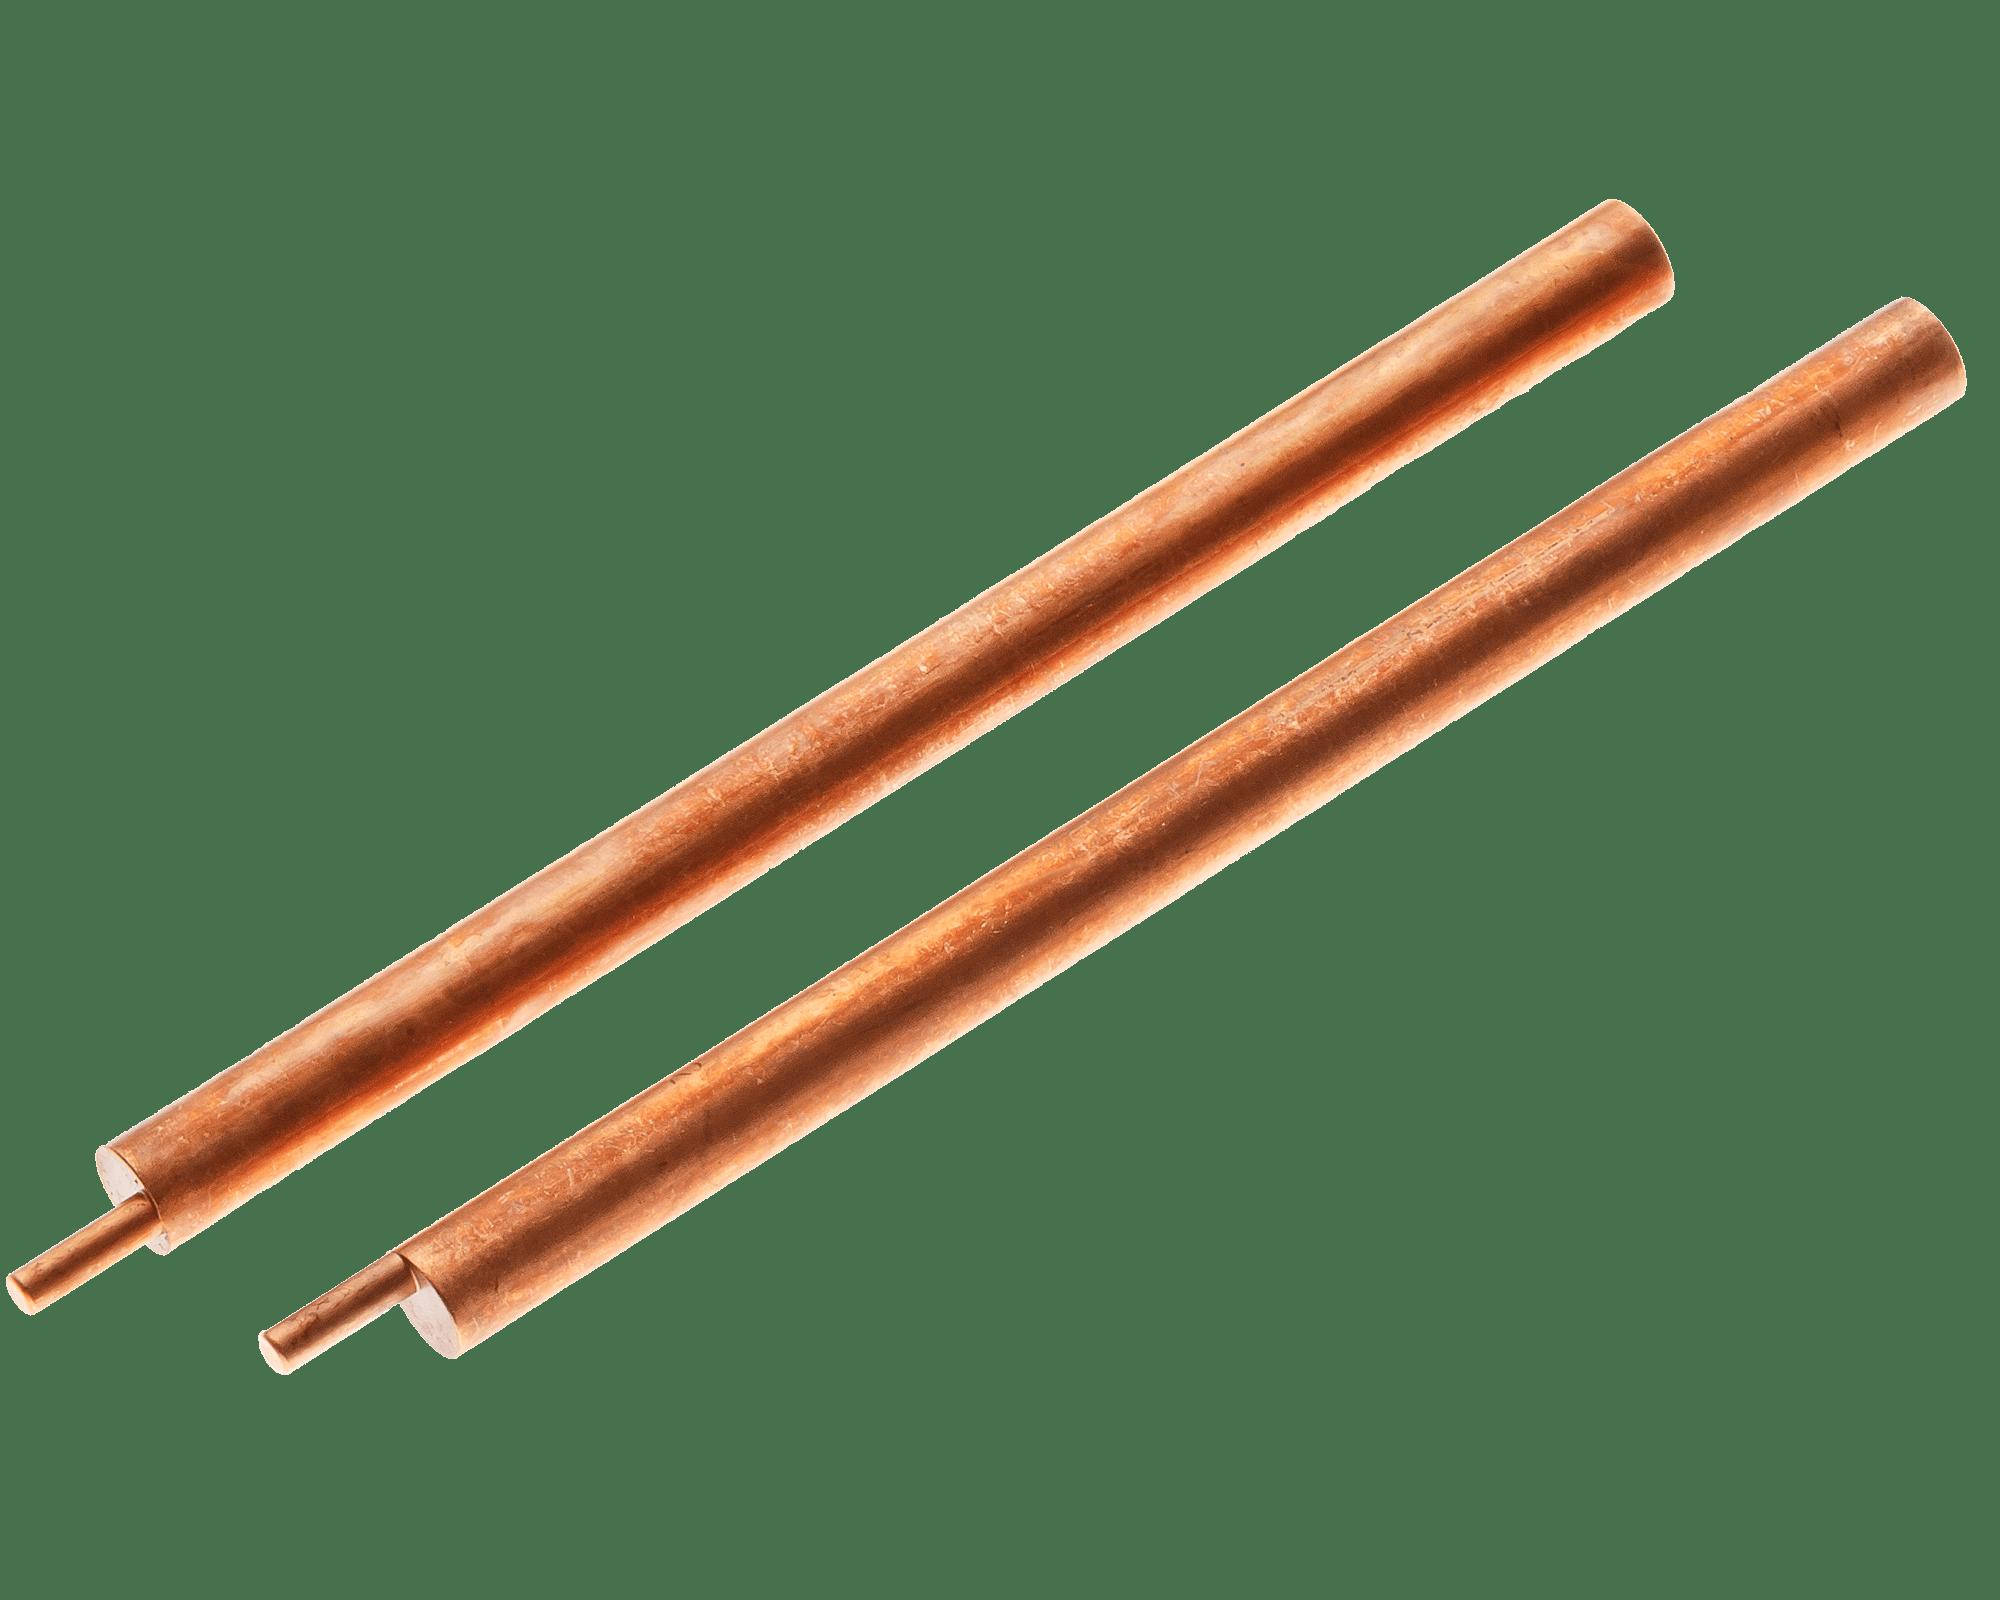 ES0802E Eccentric Electrode Set <br> .245″ OD, 3/32″ Tip OD <br> RWMA 2